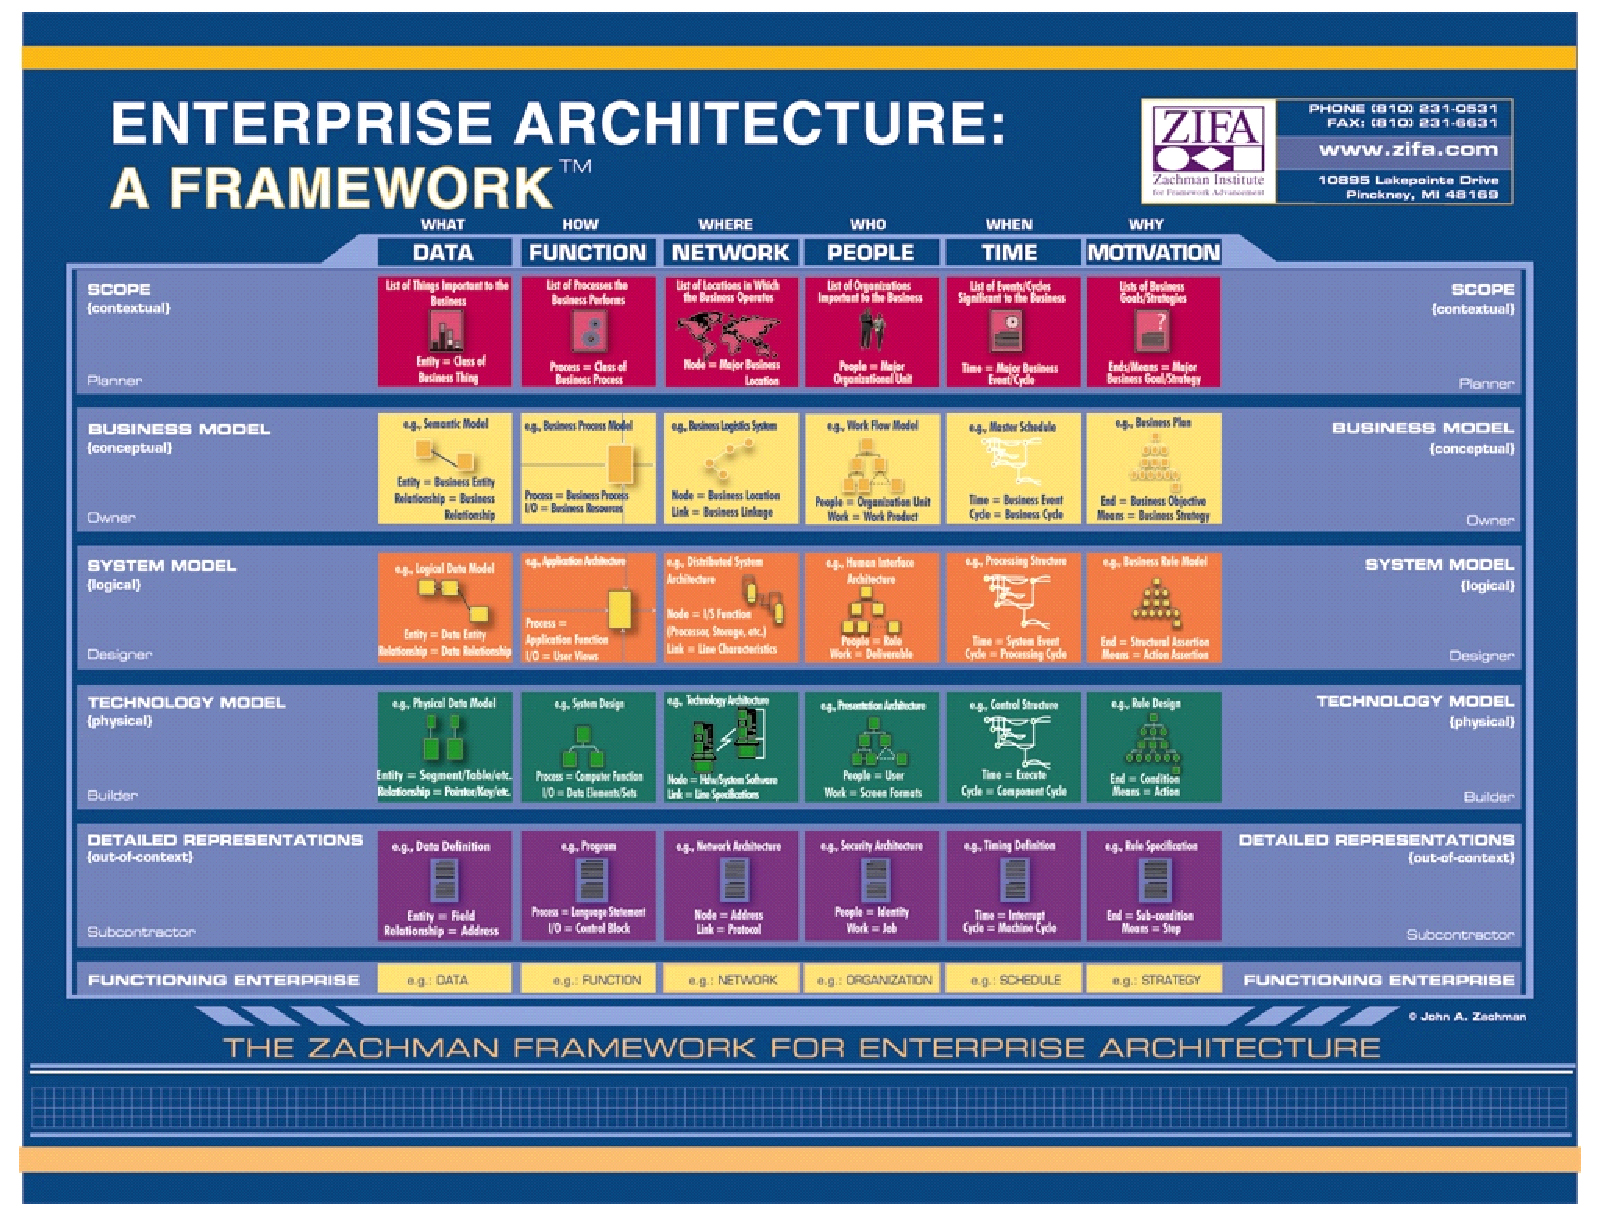 Sap Business One Architecture Diagram 1998 Chevy Blazer Radio Wiring Diagrams Galleries Enterprise